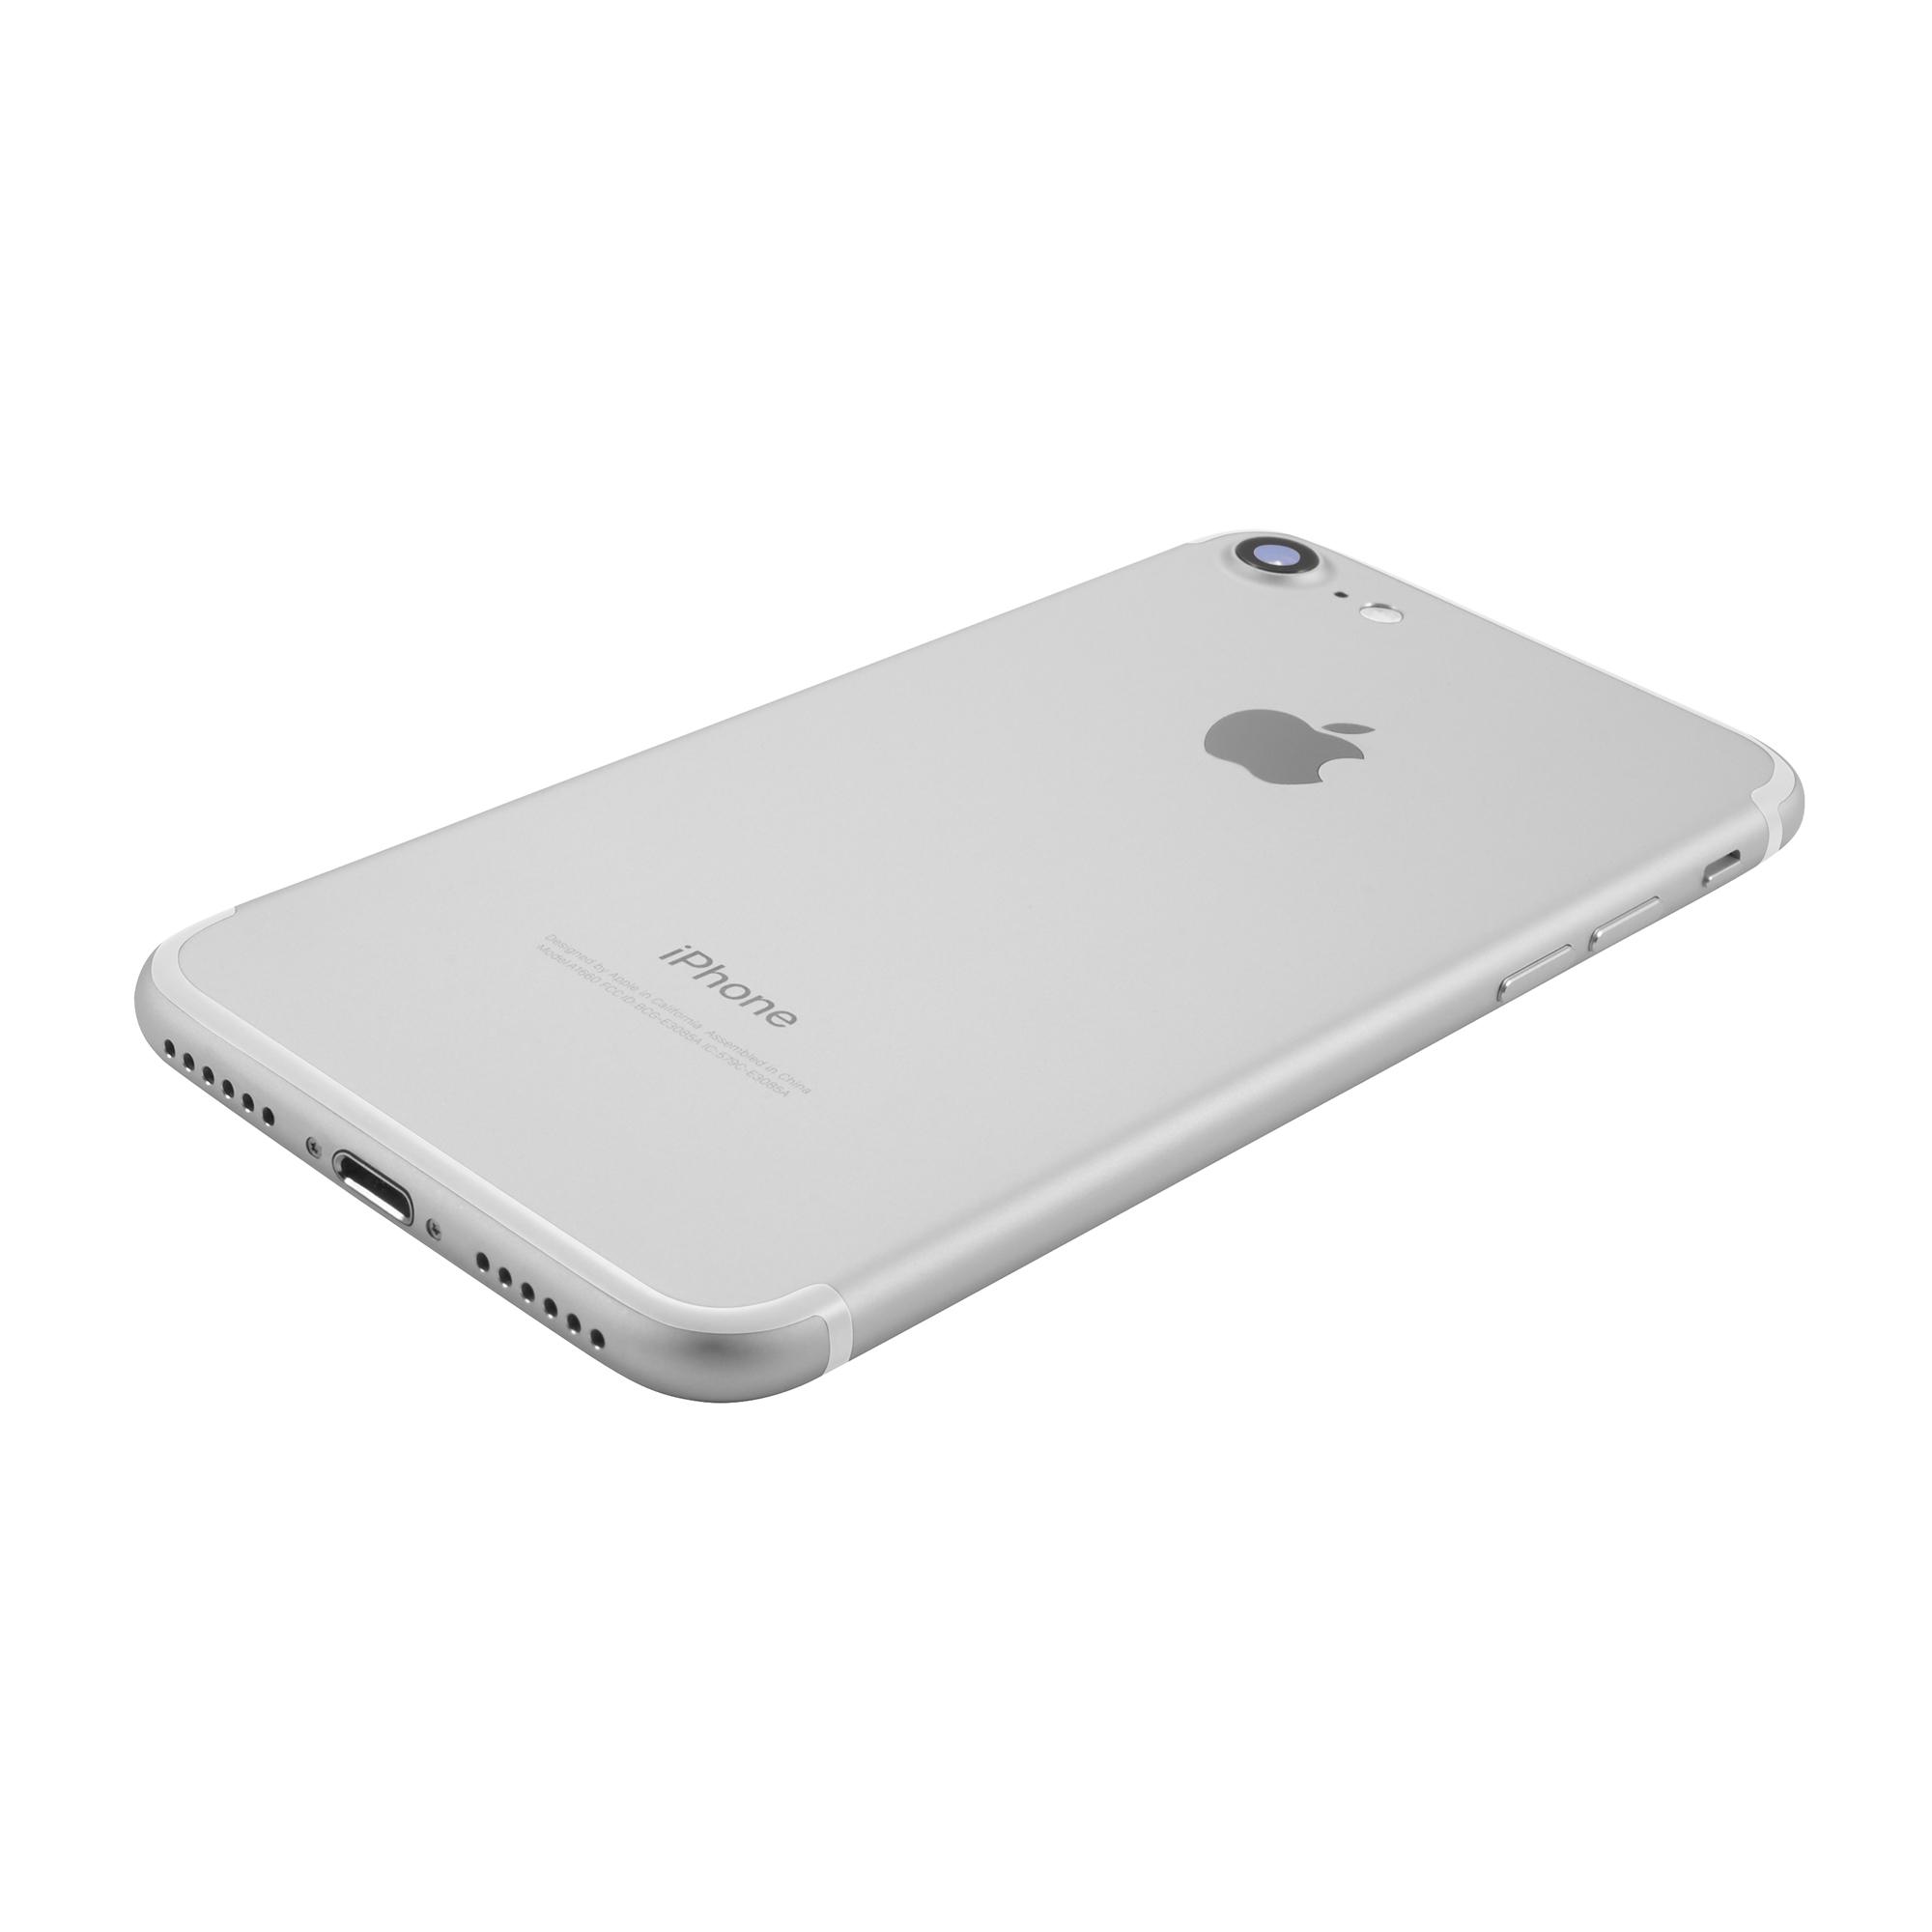 Apple iPhone 7 a1778 32GB GSM Unlocked